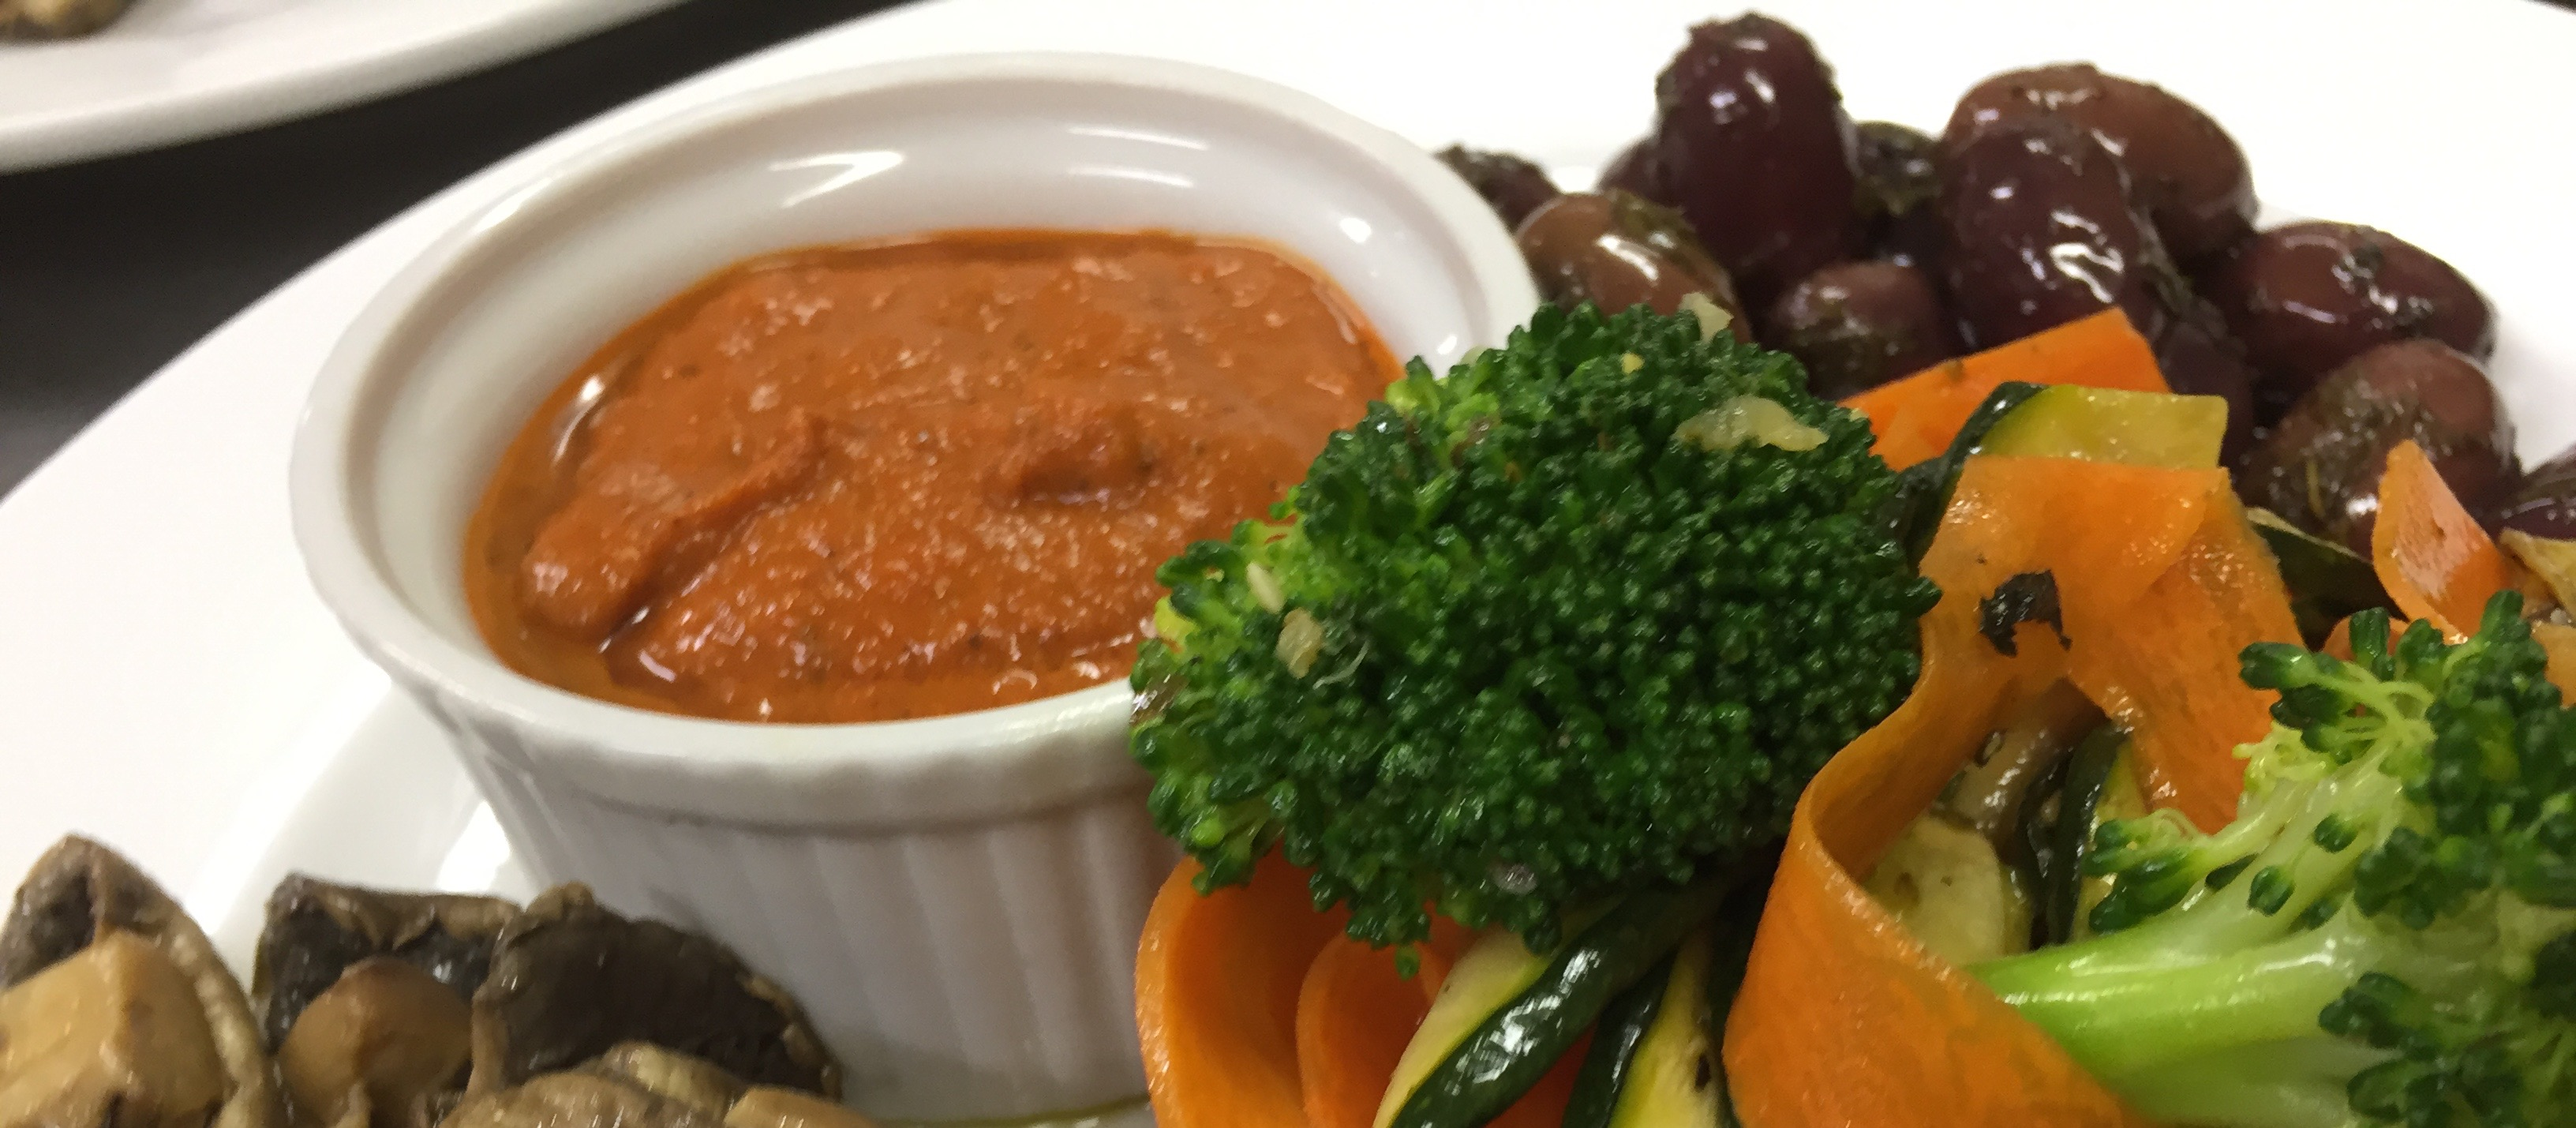 Selection of Marinated Olives, Marinated Mushrooms, Vegetable Toss & Roasted Capsicum Dip